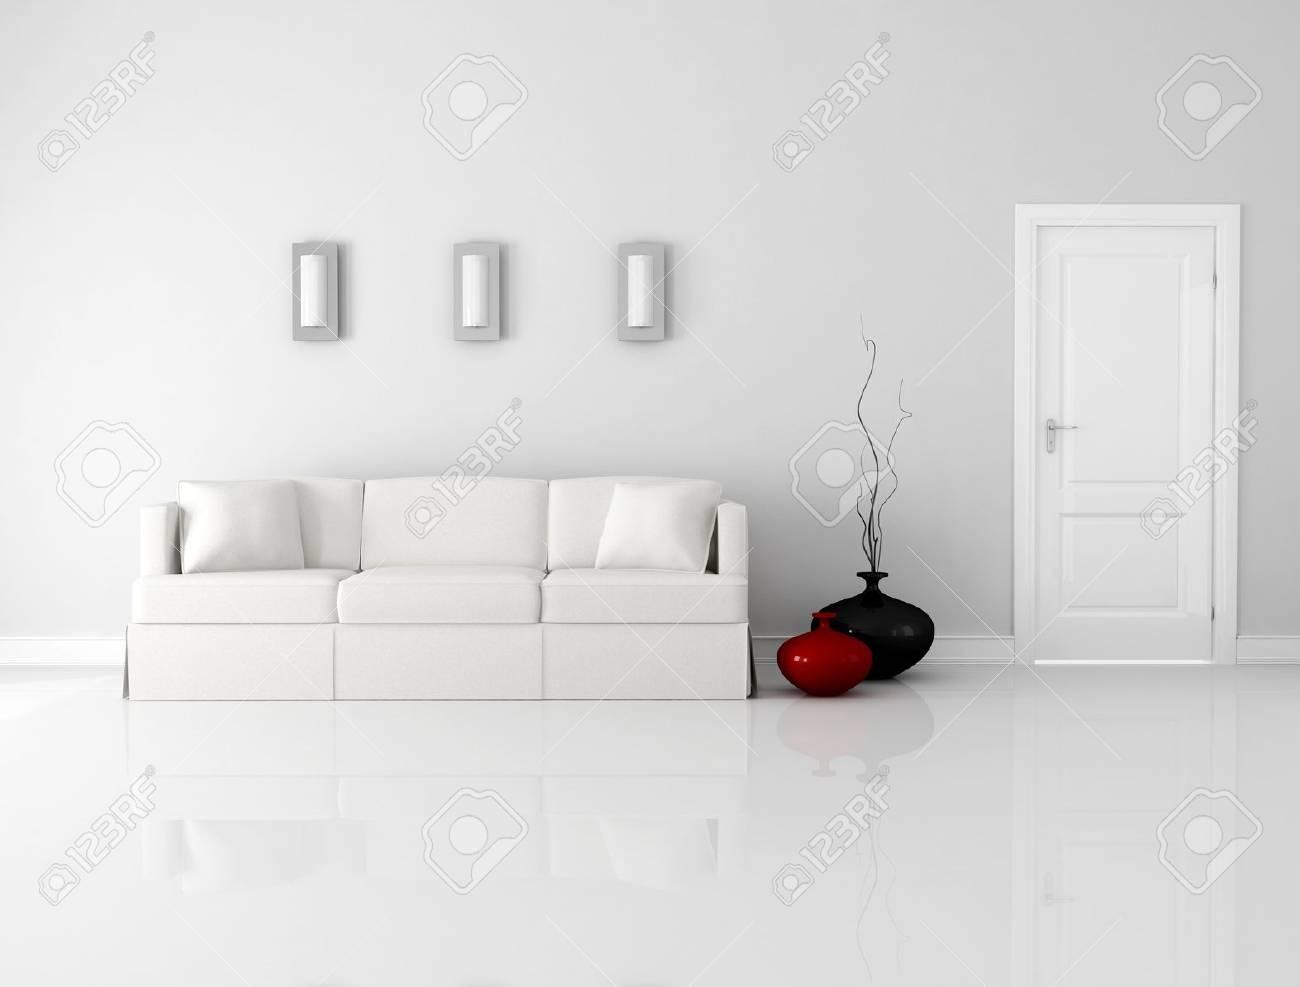 minimalist white interior with elegant sofa and door - rendering Stock Photo - 9390494 & Minimalist White Interior With Elegant Sofa And Door - Rendering ...